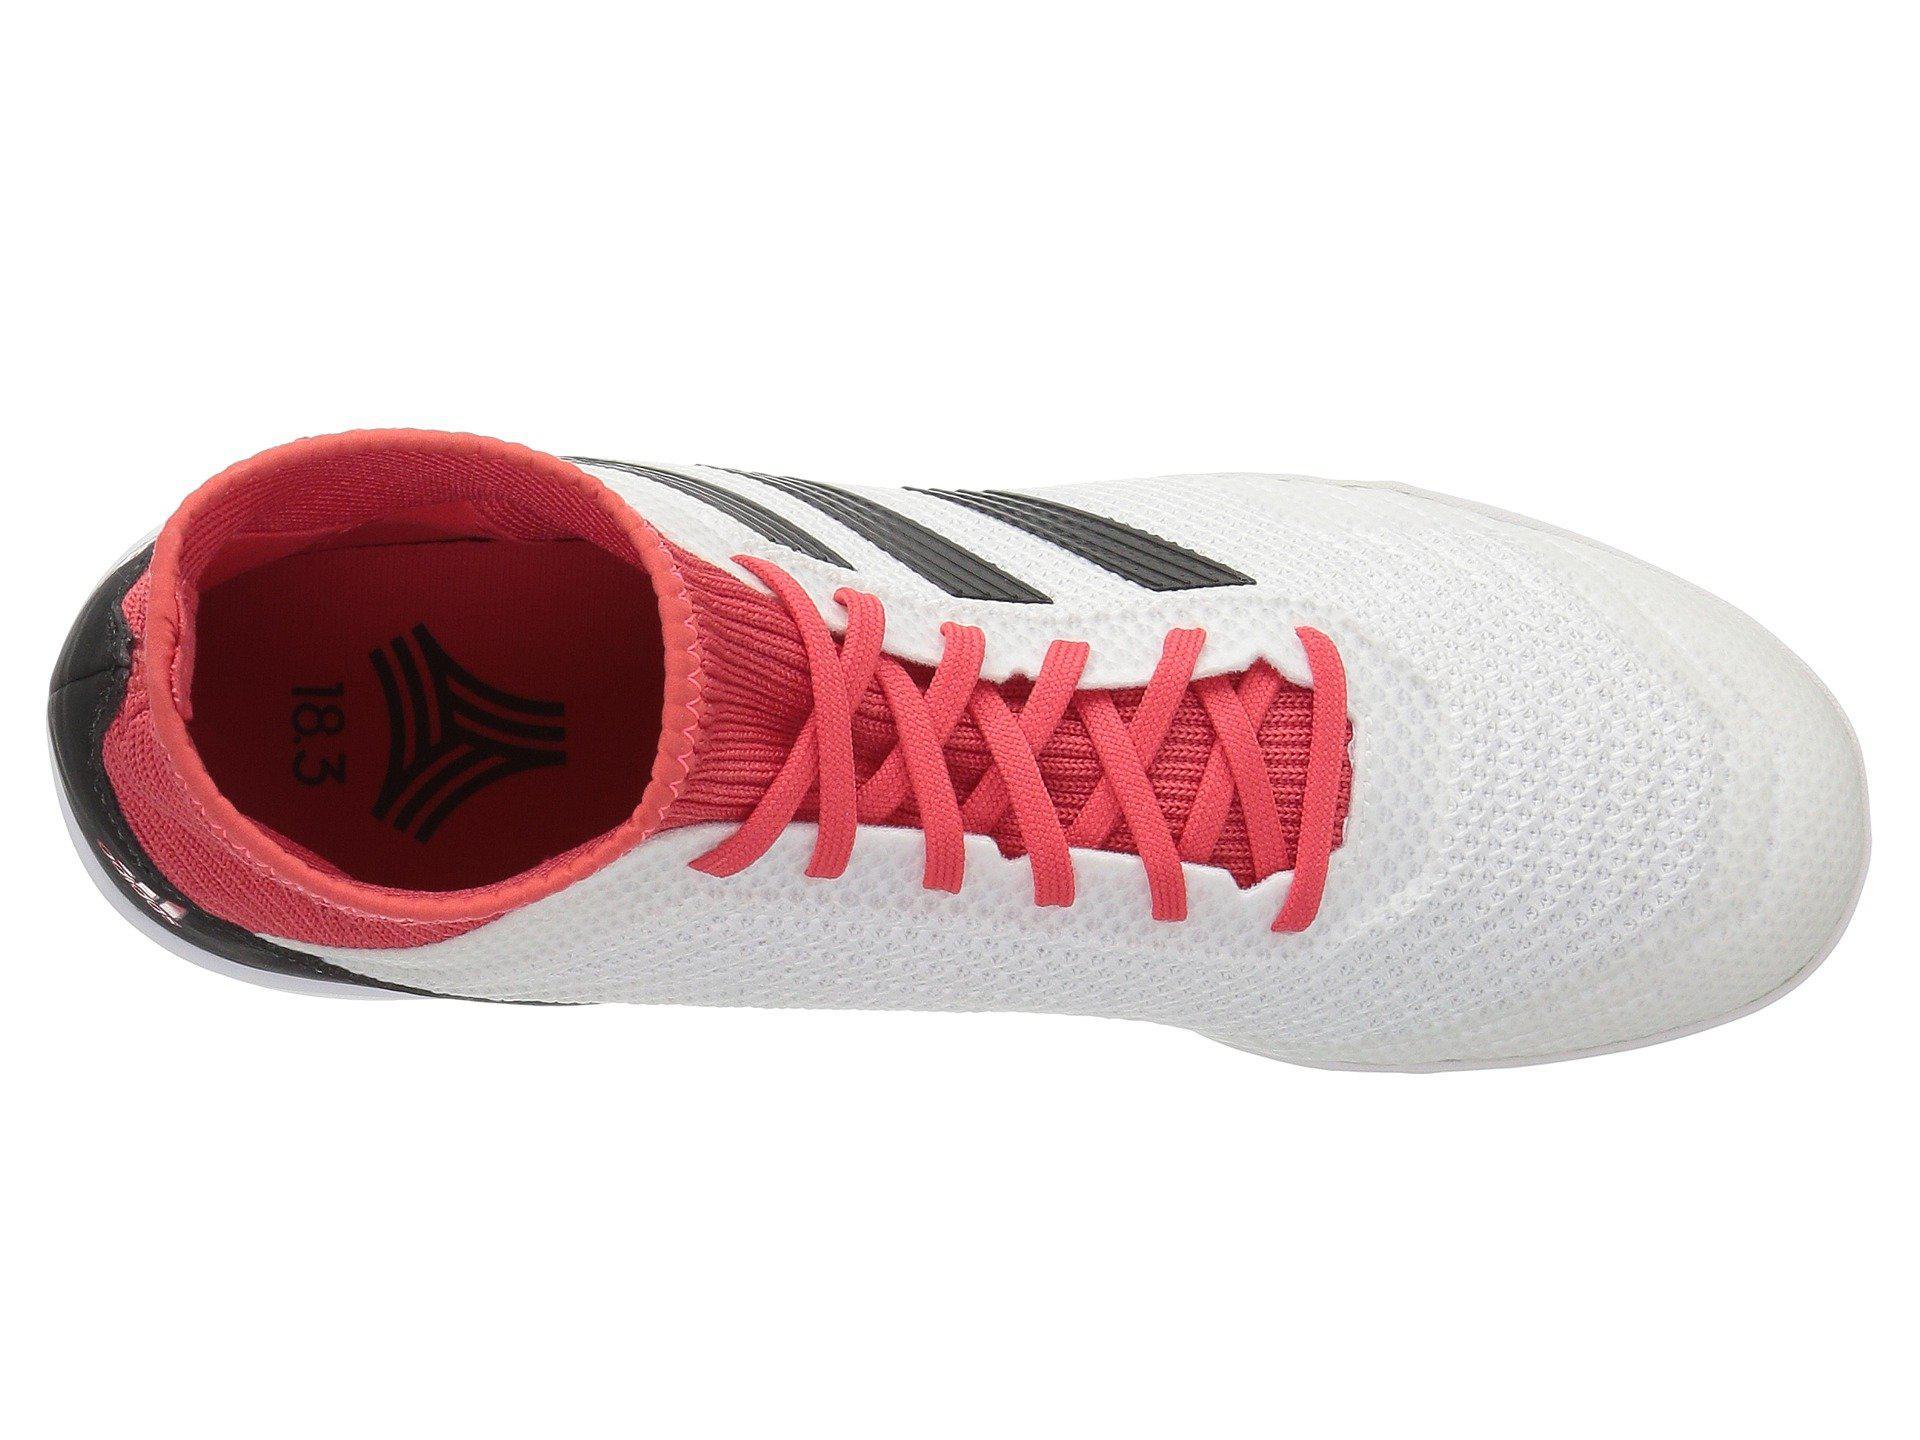 026bc10e70e Adidas - Multicolor Predator Tango 18.3 Indoor for Men - Lyst. View  fullscreen